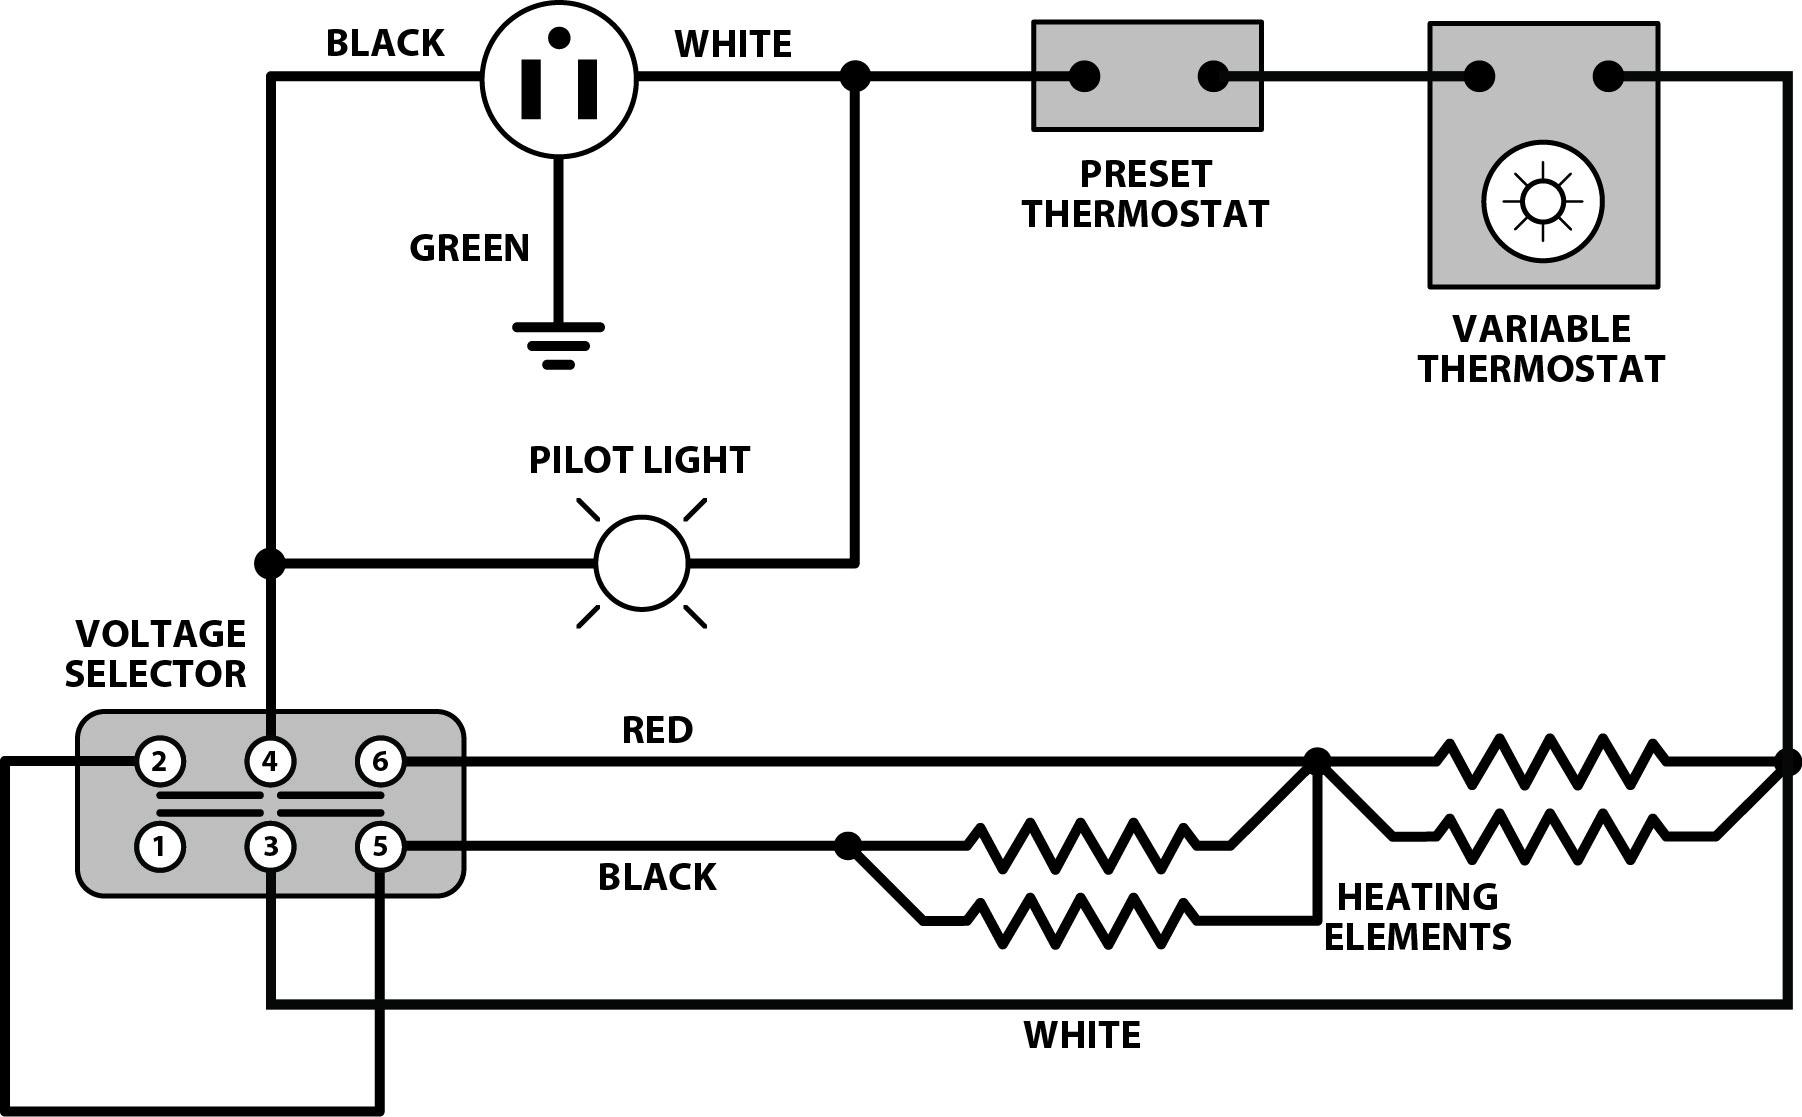 wiring diagram green mountain grill free download wiring diagram rh xwiaw us Green Mountain Grill Daniel Boone green mountain pellet grill wiring diagram